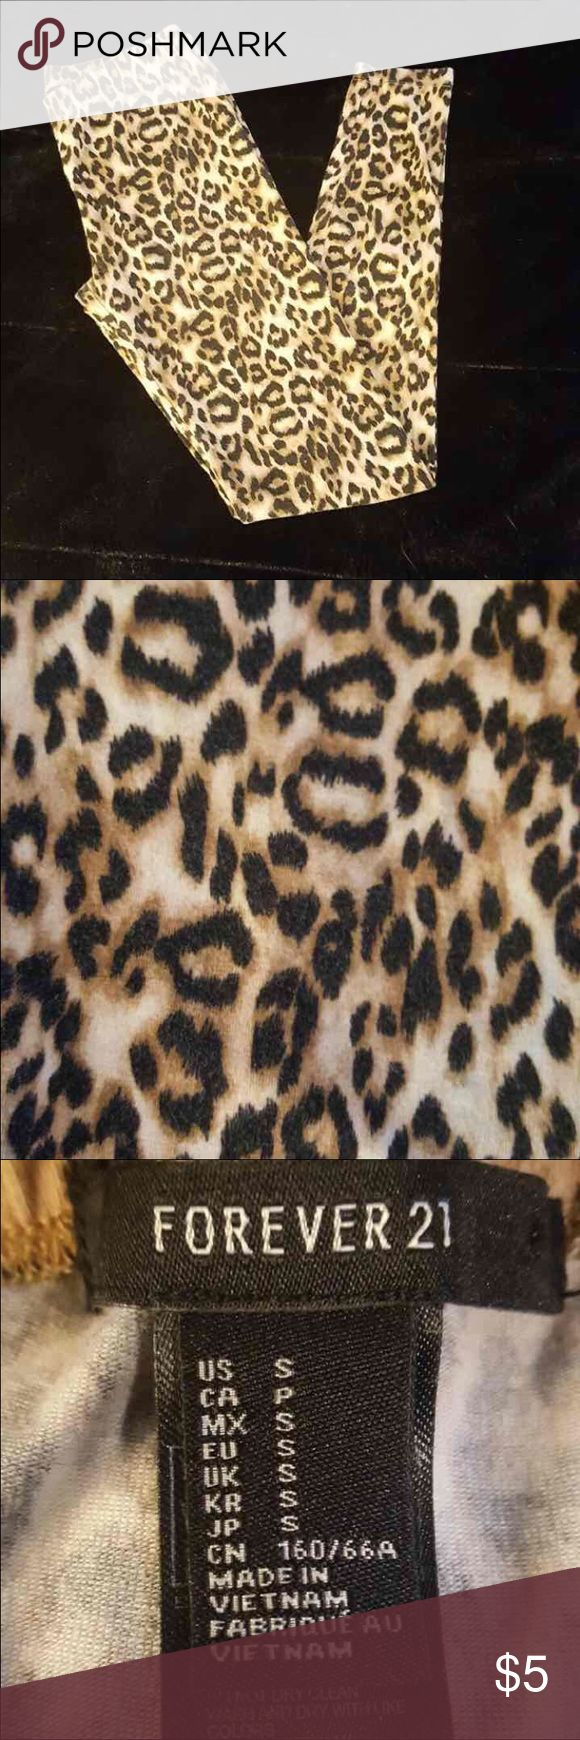 Sz Small Forever 21 Cheetah Leggings Look fierce and fabulous in these cheetah leggings! Forever 21 Pants Leggings